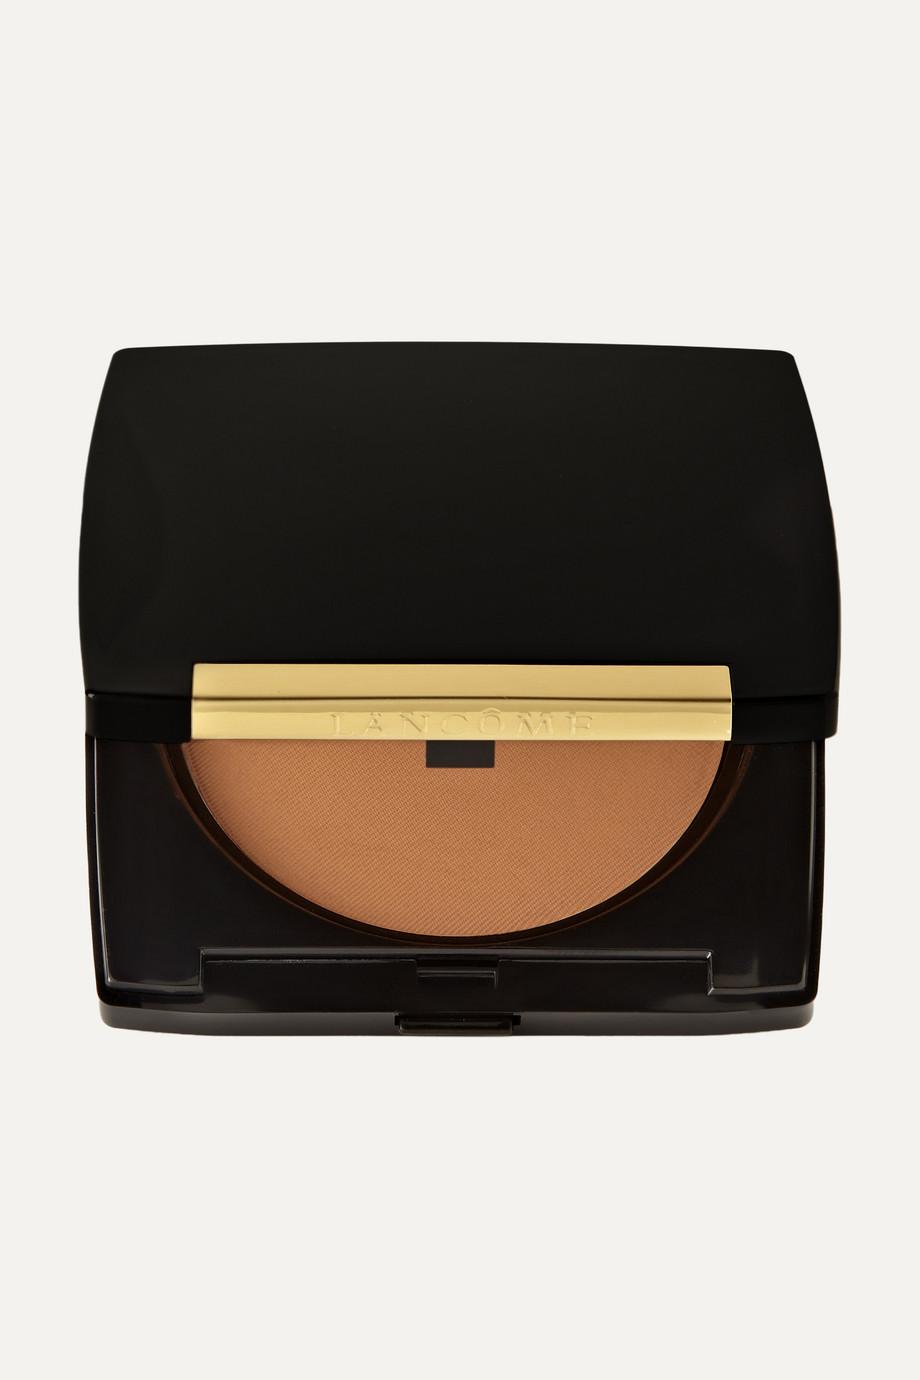 Lancôme Dual Finish Versatile Powder Makeup - Suede 510